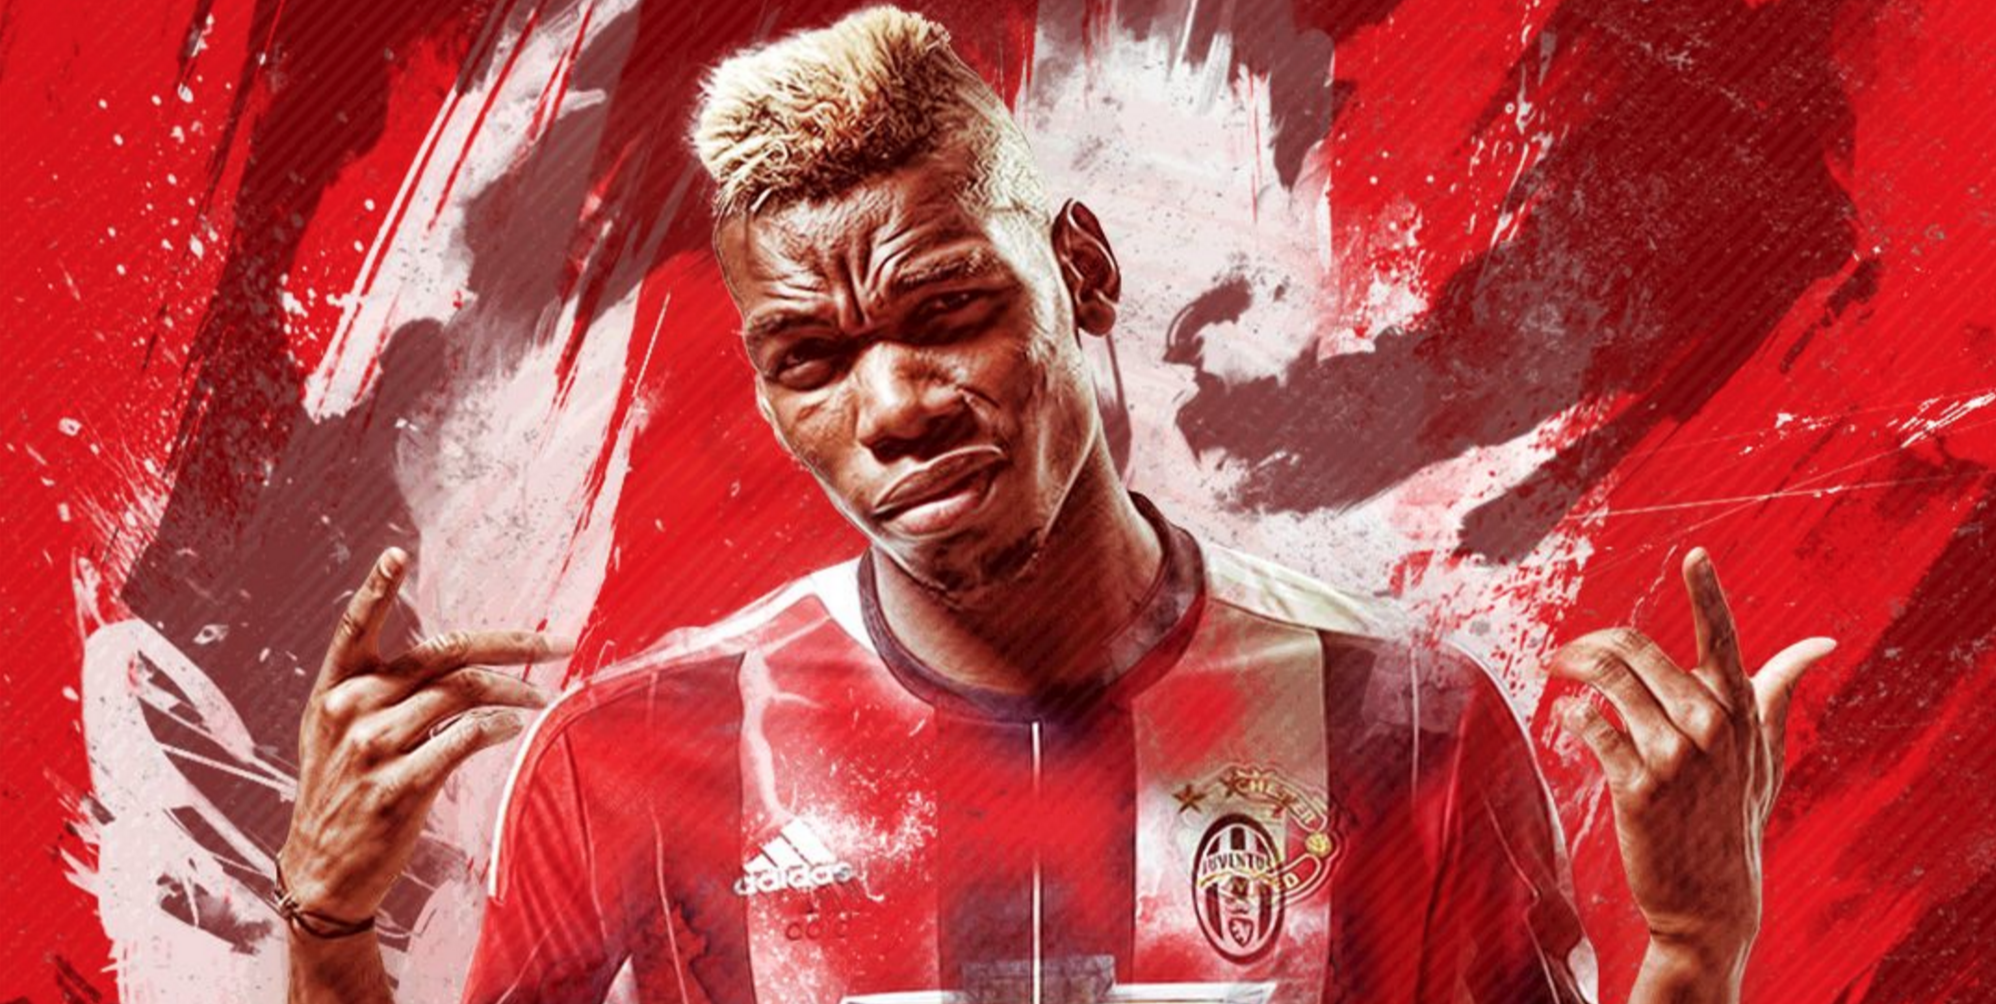 Paul Pogba Manchester United 120 millions euros